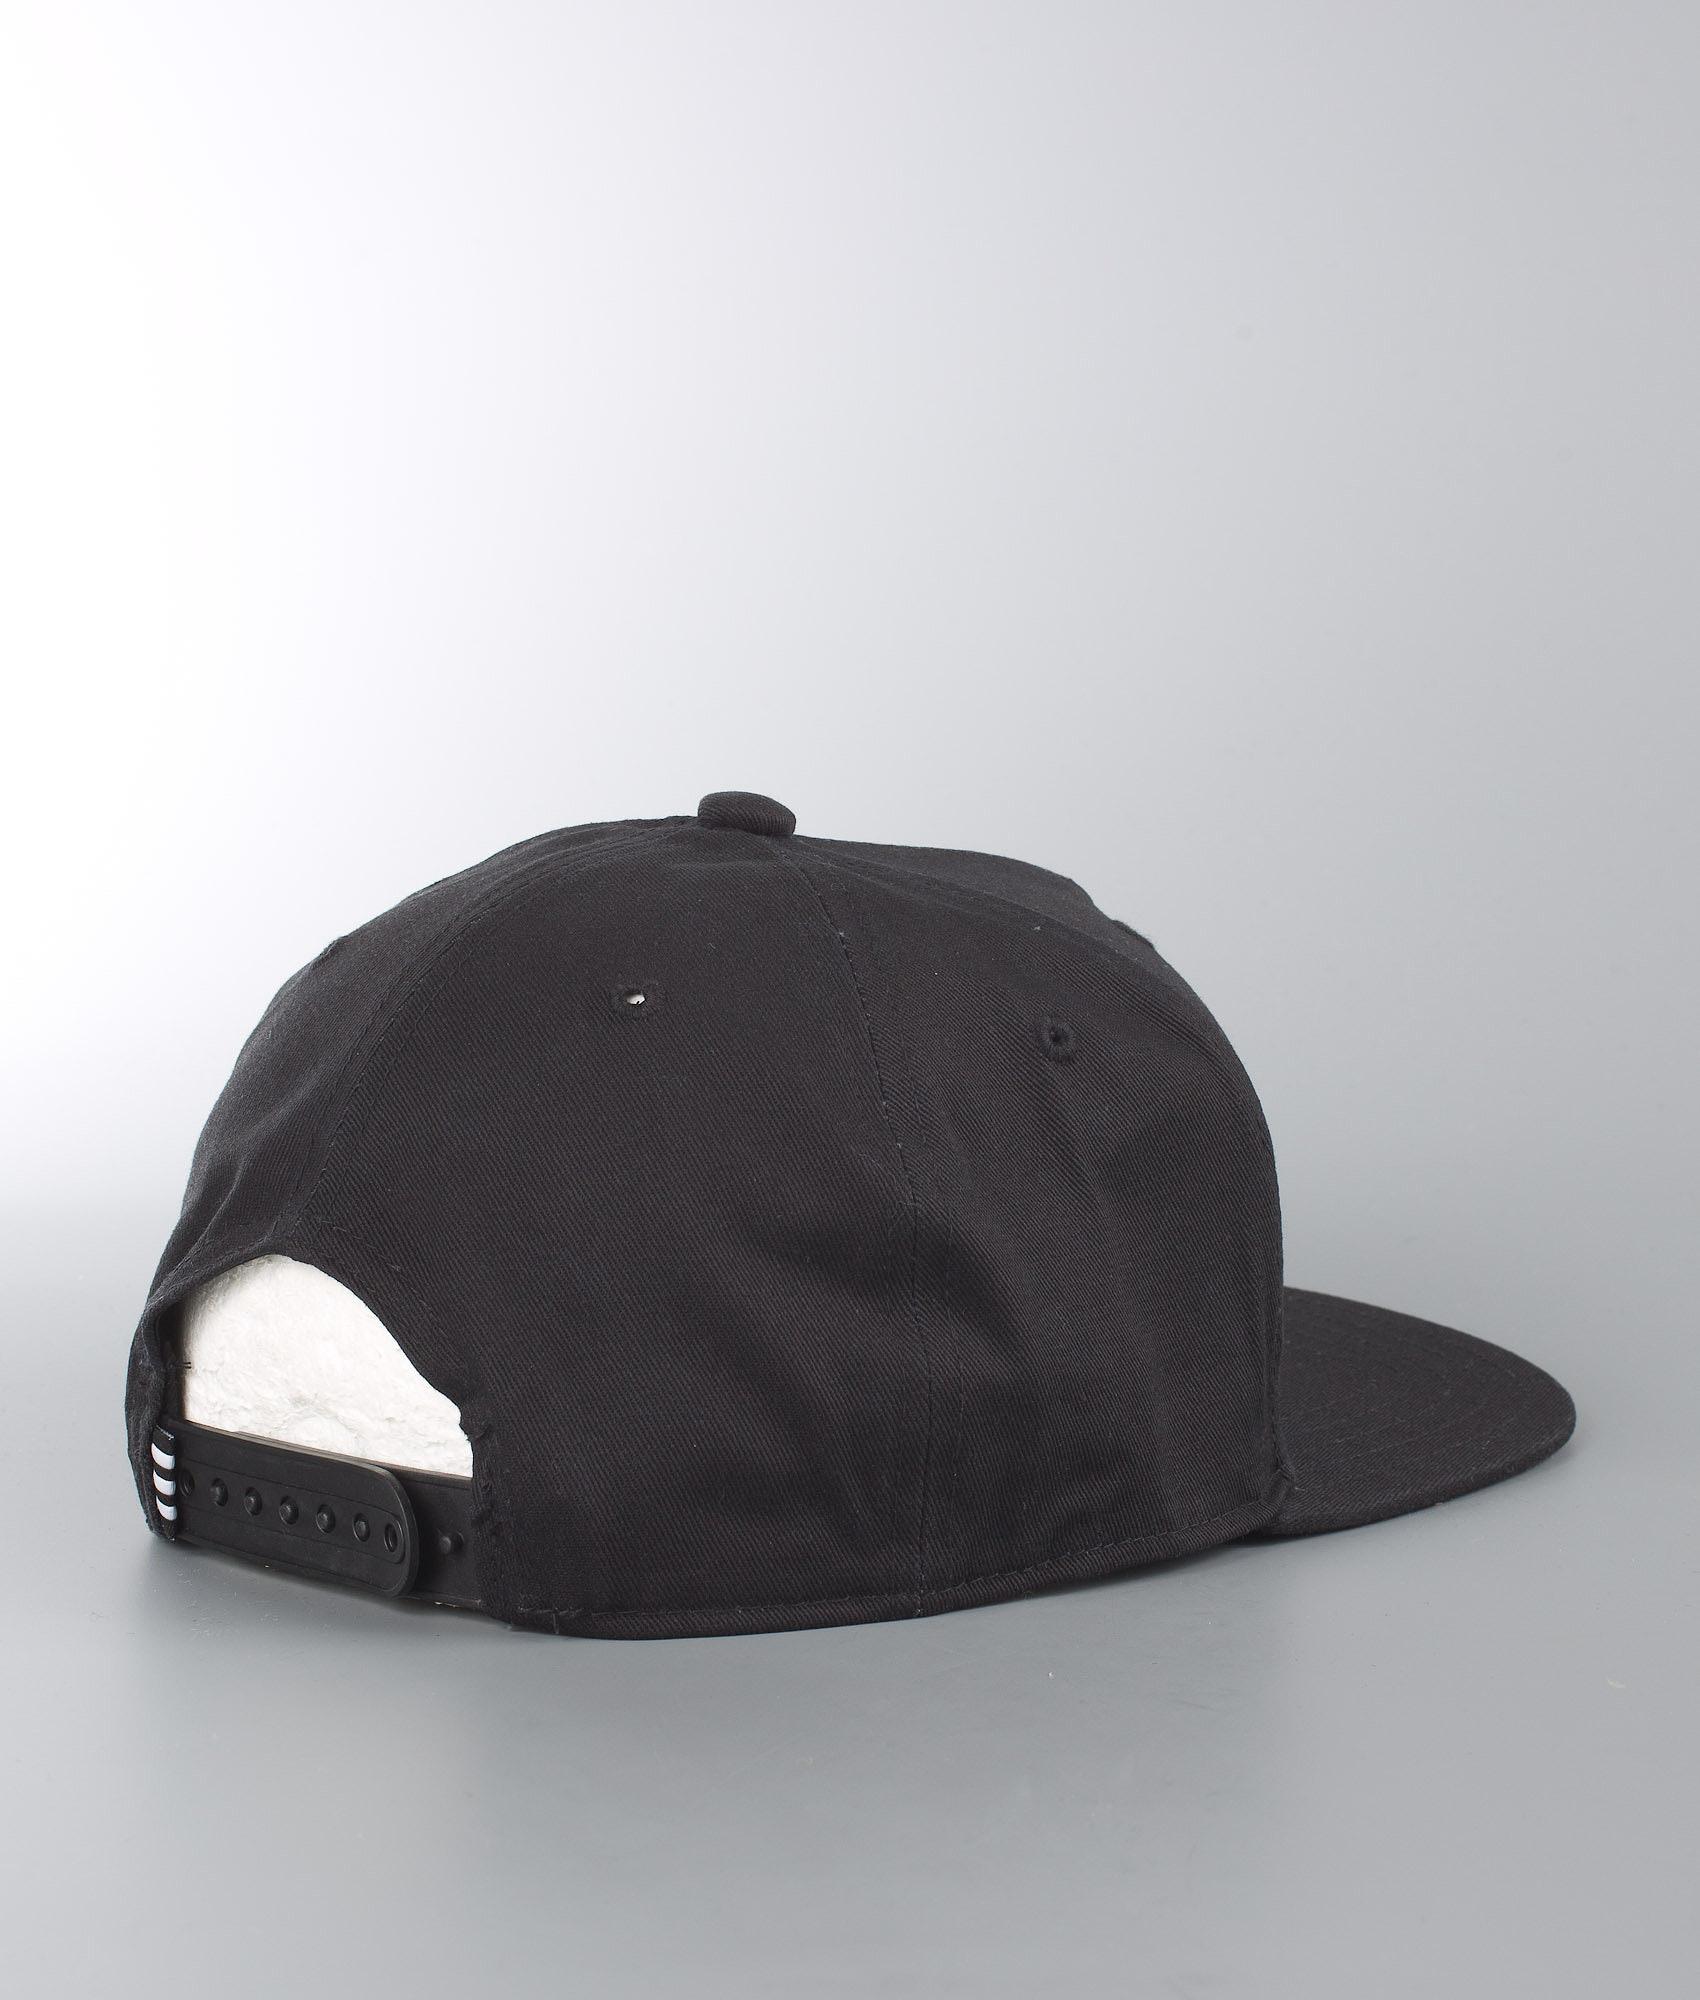 288b22e581e Adidas Originals Ac Cap Tre Flat Cap Black - Ridestore.com